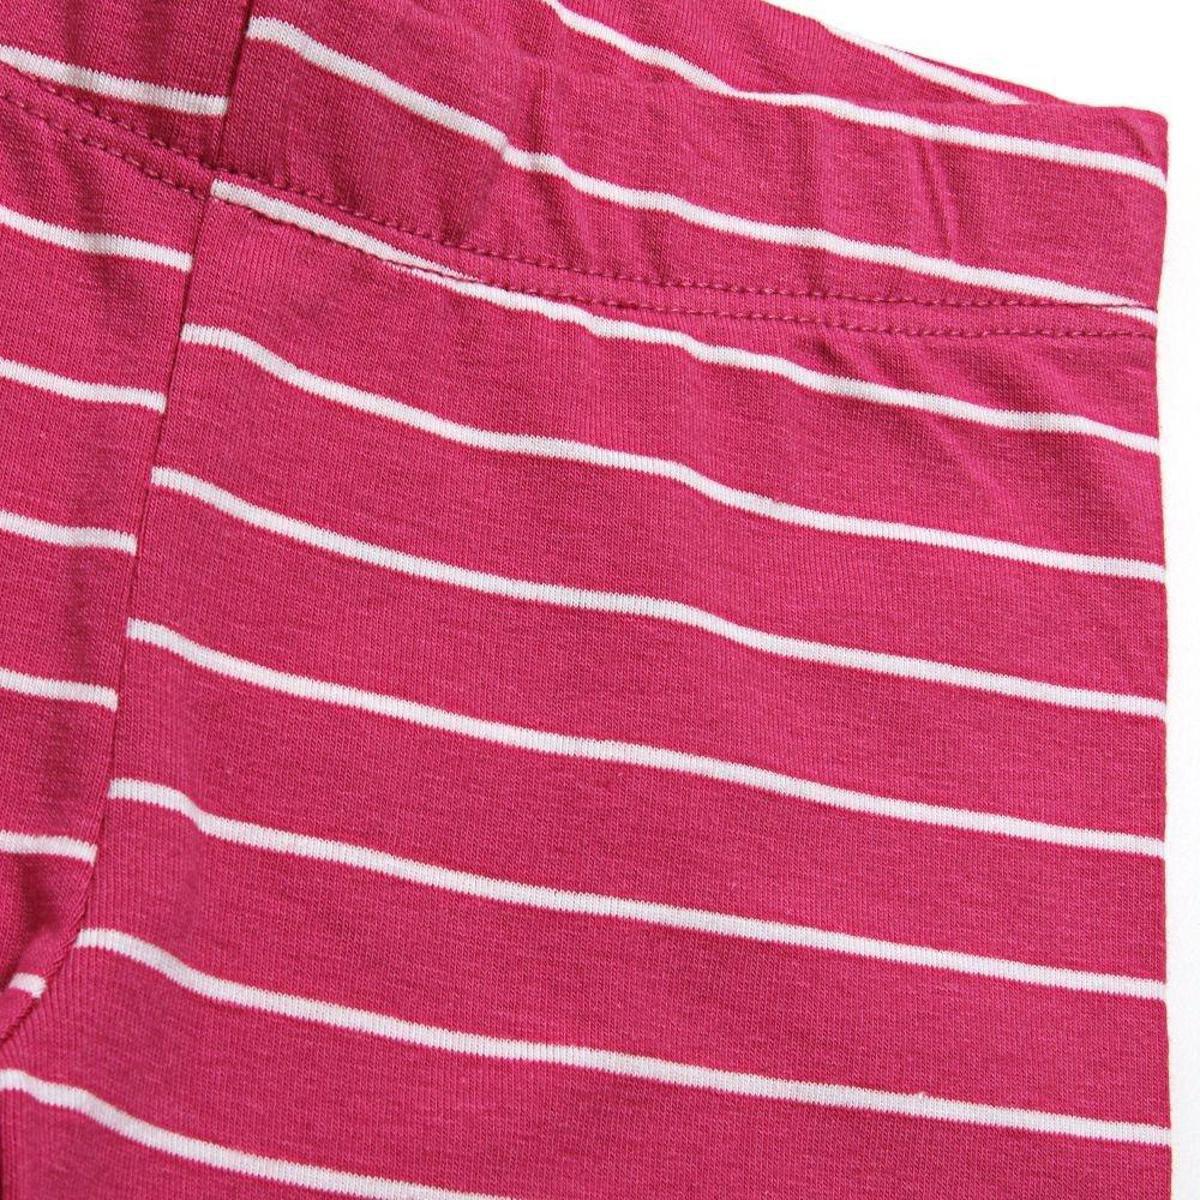 Legging Jokenpô Infantil Listra - Pink - Compre Agora  5d03a6d7ffd76